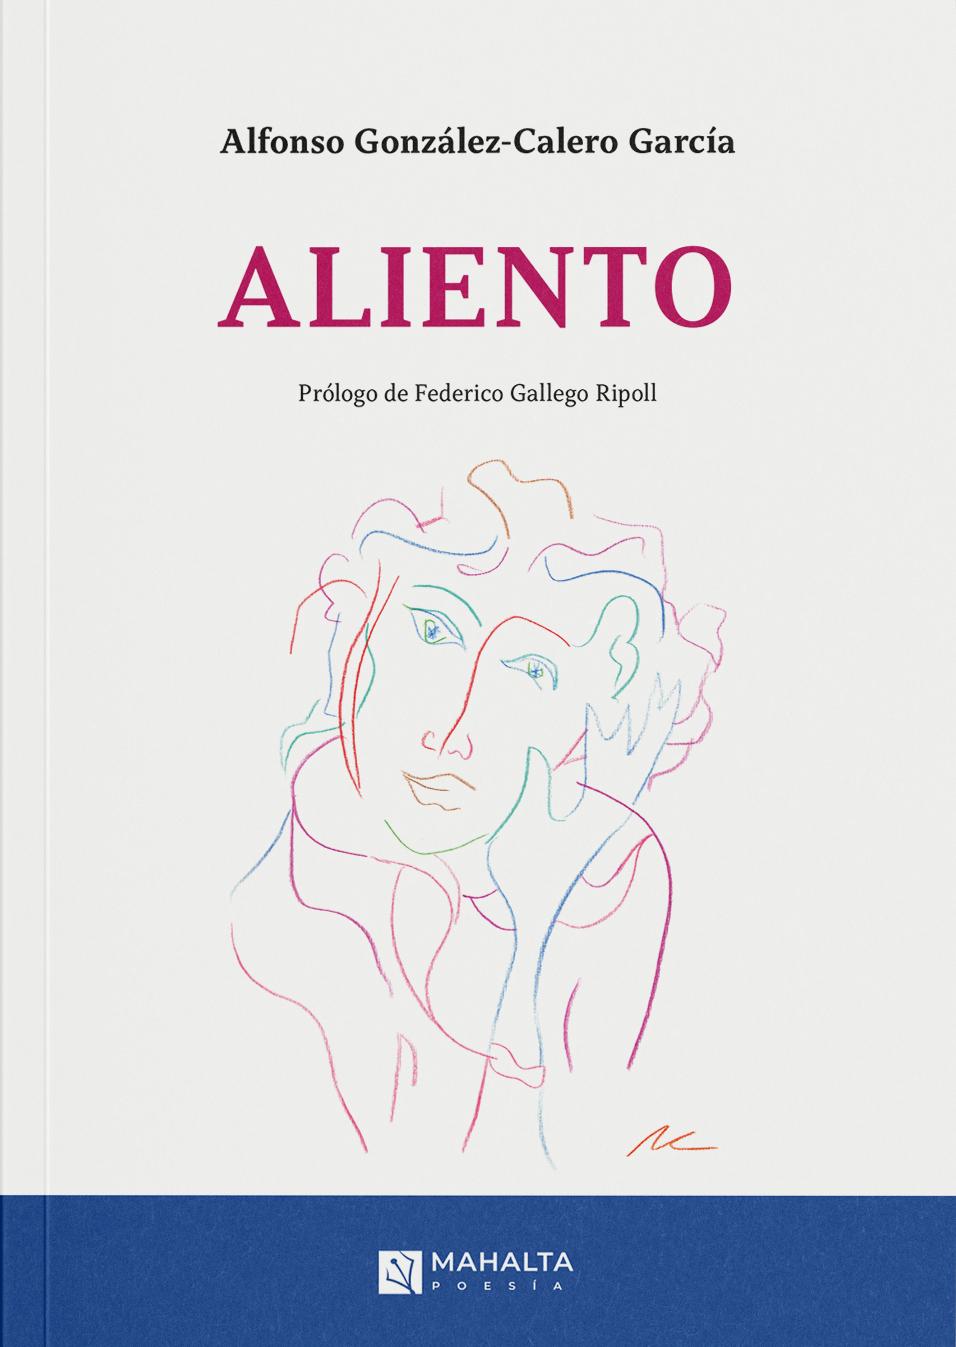 Alfonso González-Calero García ALIENTO